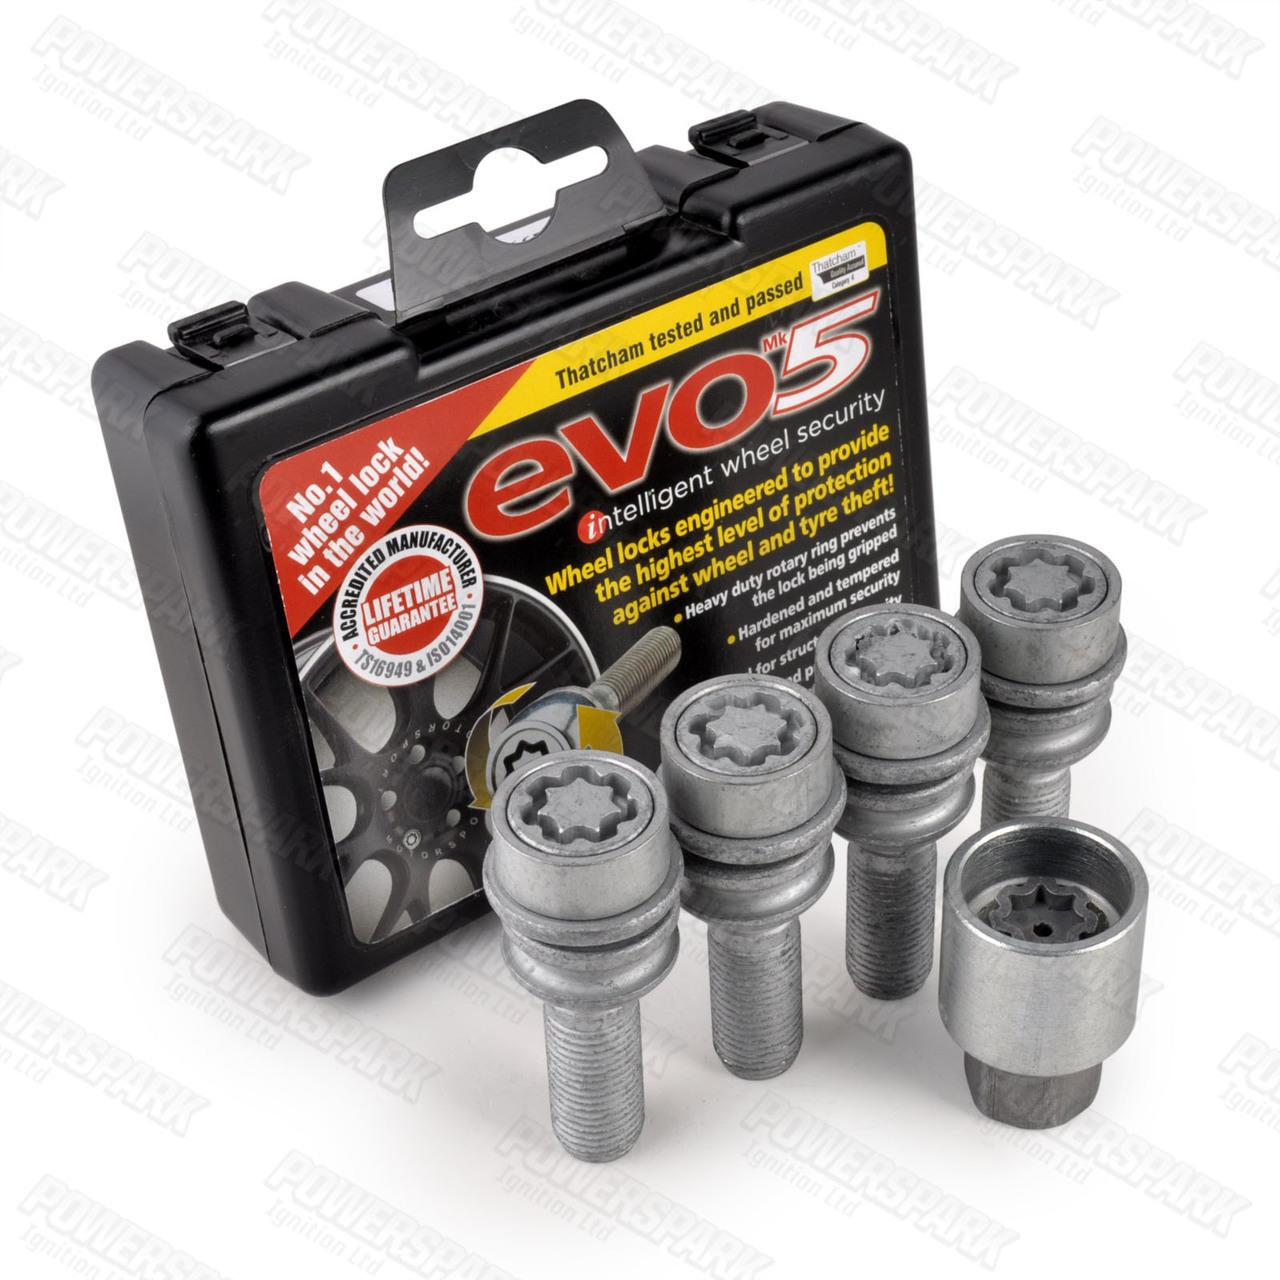 Evo MK5 Evo MK5 Locking Alloy Wheel Bolts 299/5 for Volkswagen T5 Transporter, Amarok, Touareg and Porsche Macan, GT2 and GT3